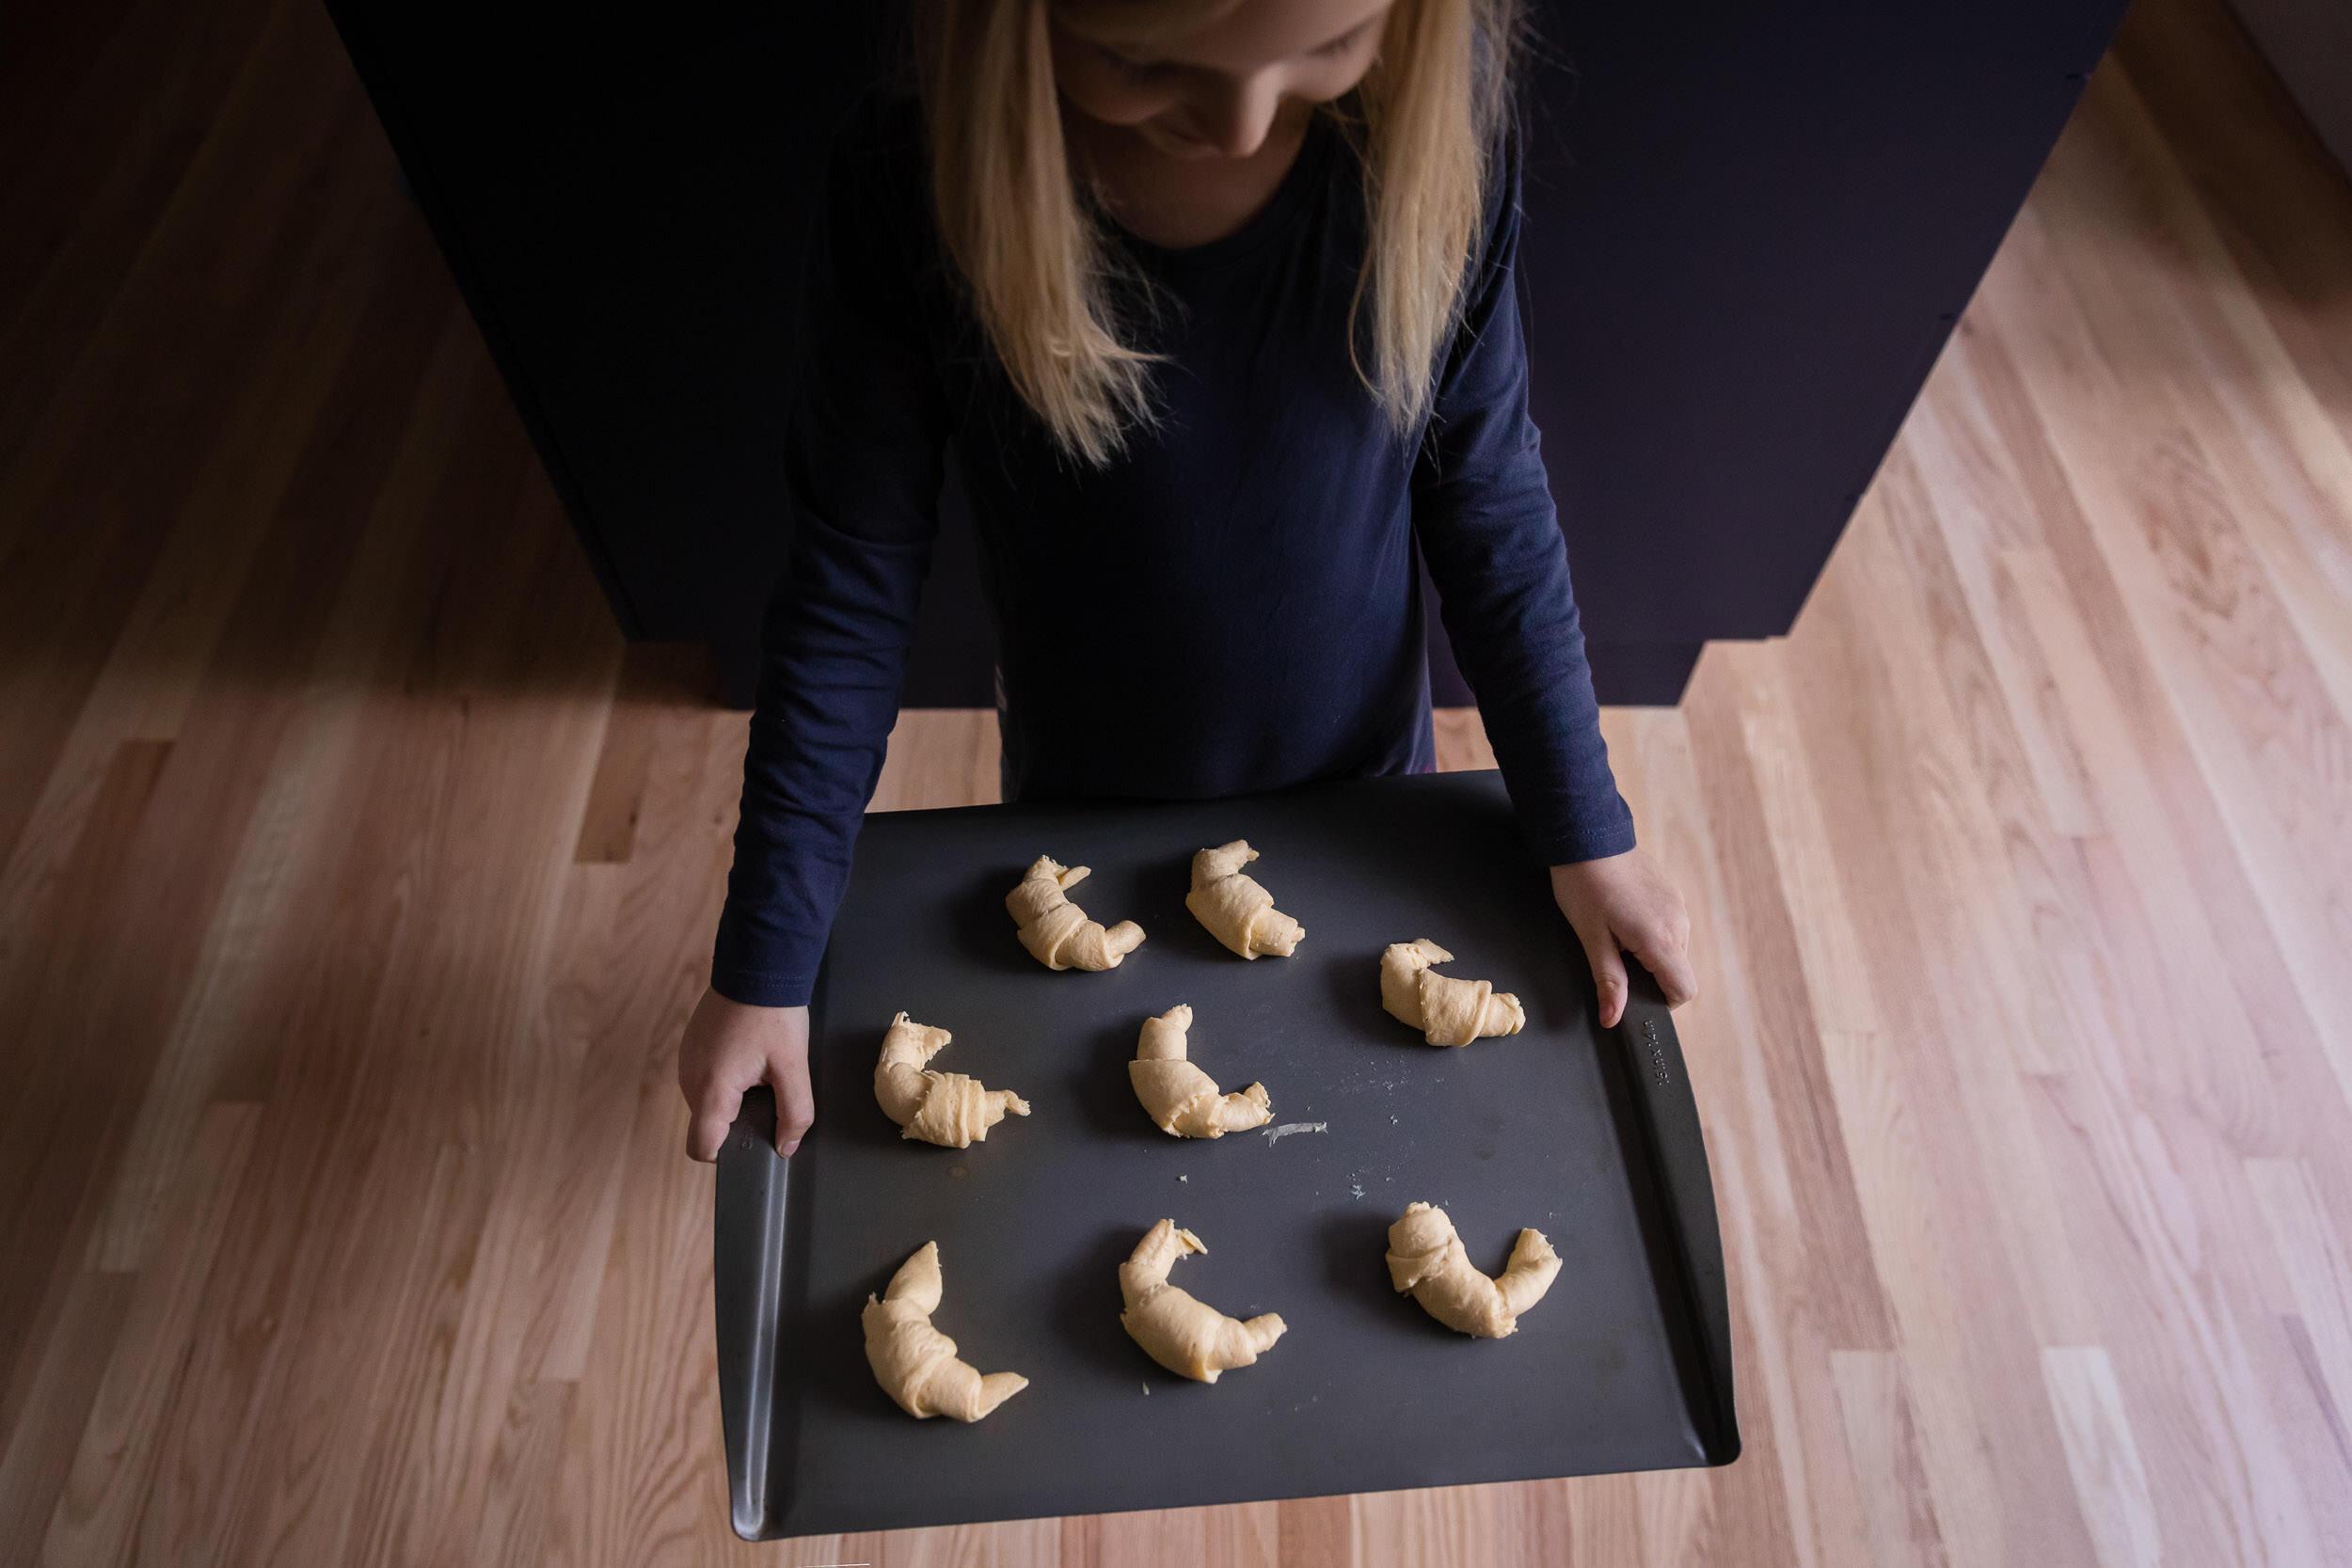 kids-cooking-In-Home-photography-family-session-portland-oregon-rebecca-hunnicutt-farren-22.jpg